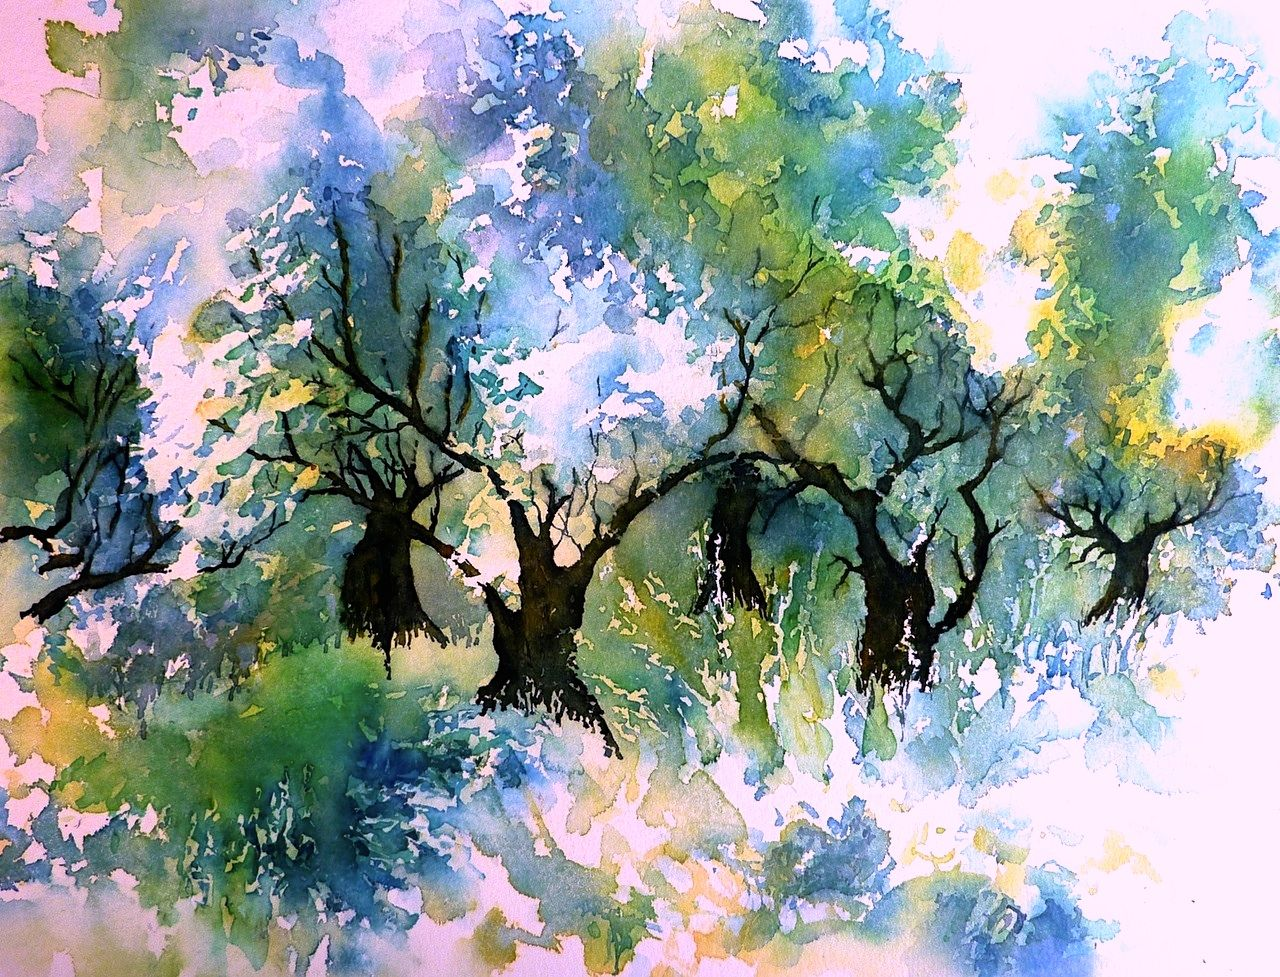 olivenhain auf kreta aquarellmalerei olive grove griechenland olivenbaum von thomas. Black Bedroom Furniture Sets. Home Design Ideas